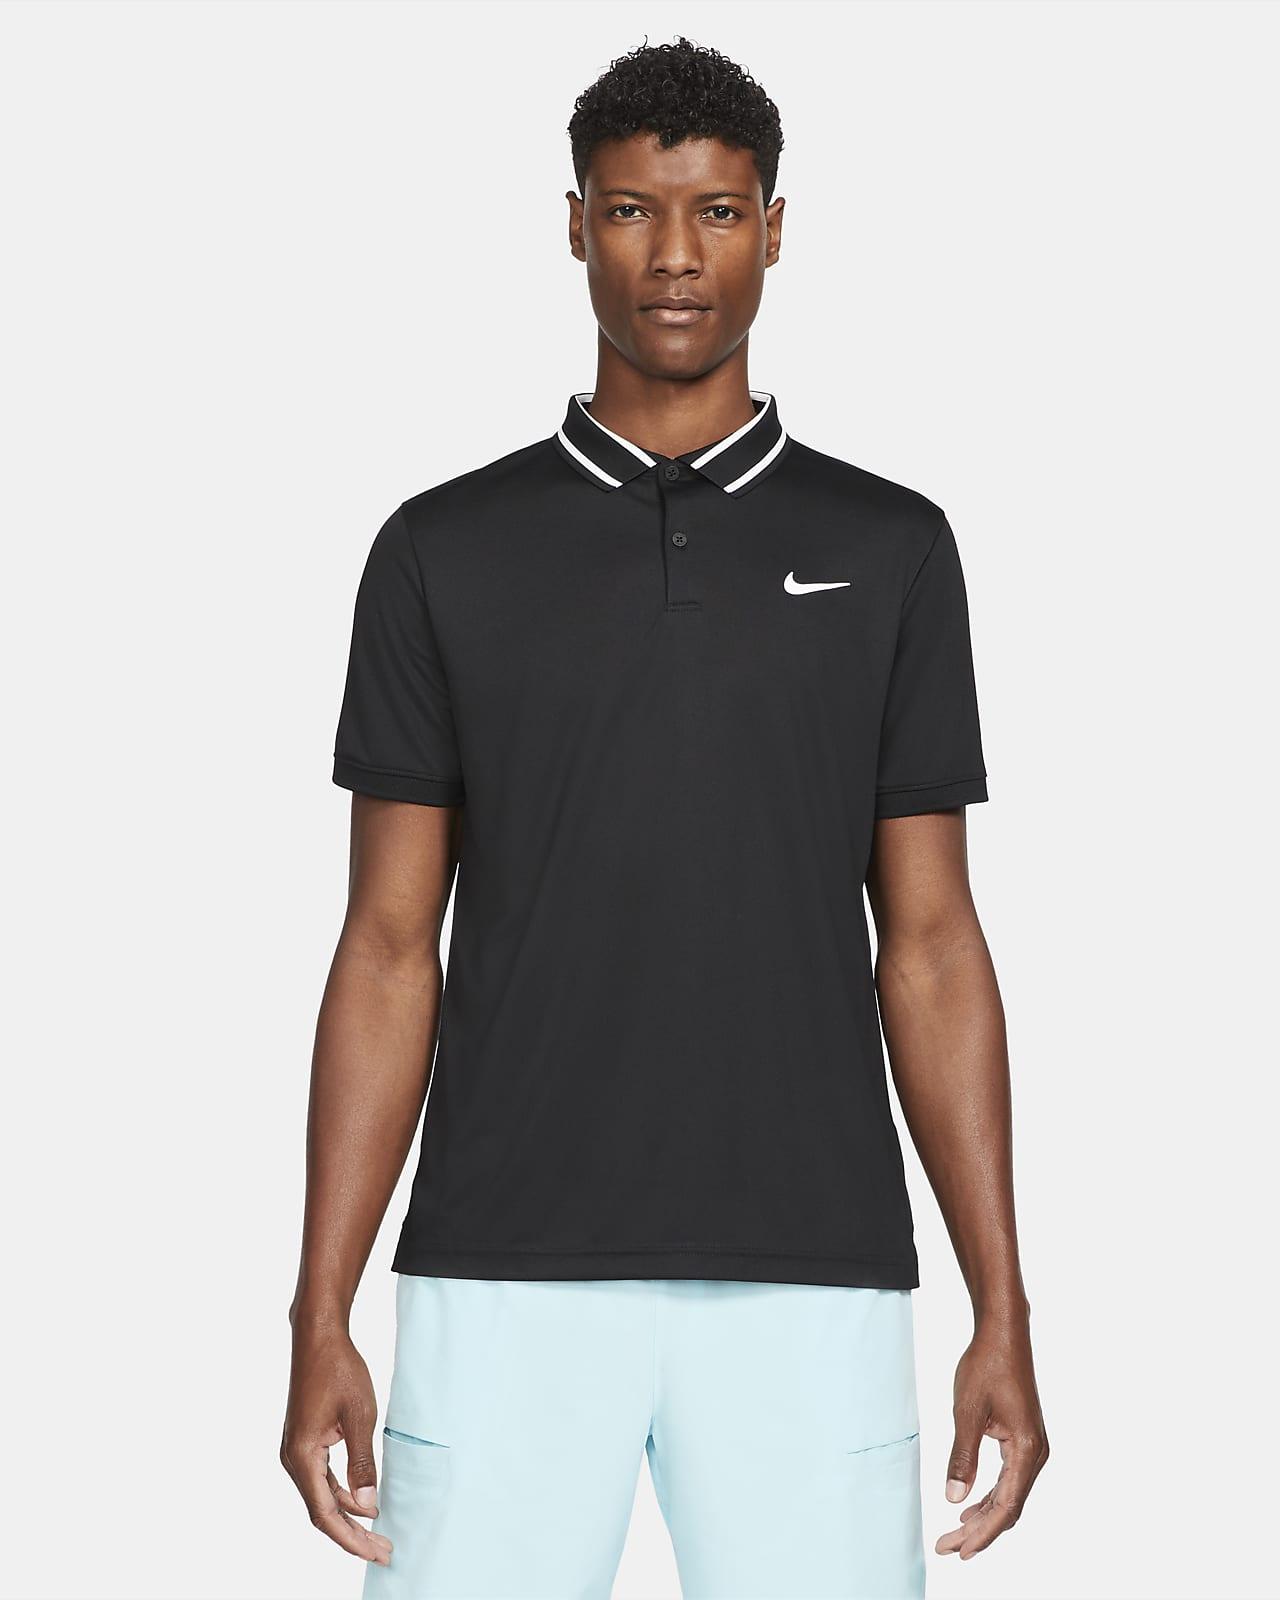 NikeCourt Dri-FIT Victory Men's Tennis Polo